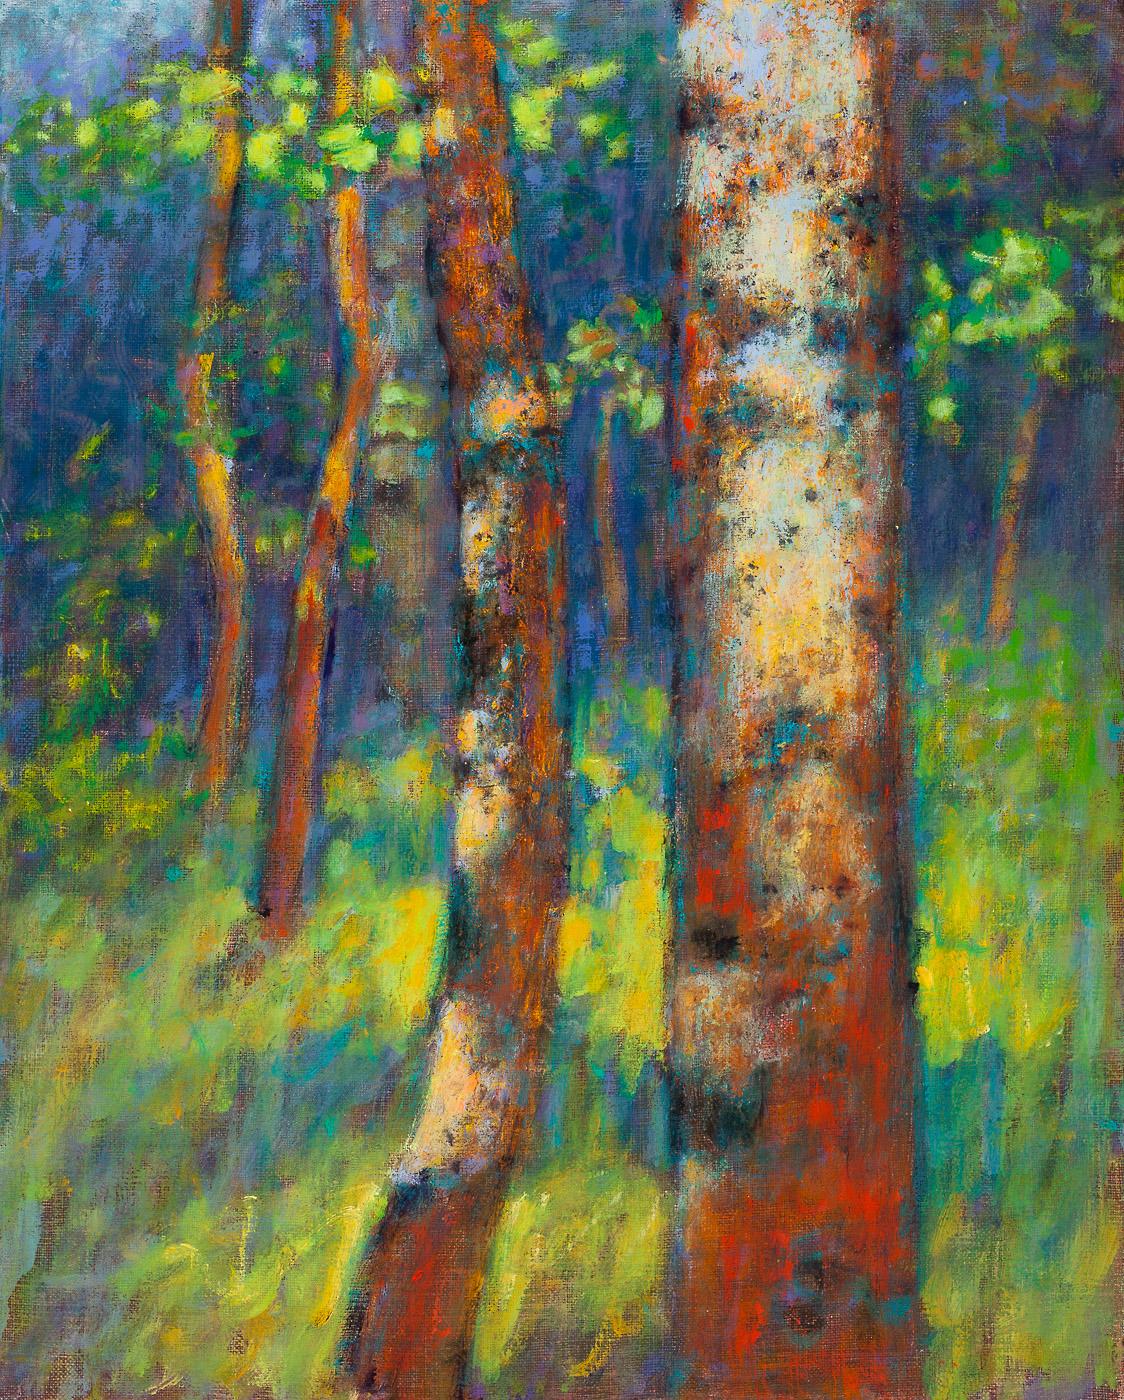 "High Mountain Aspens | oil on linen | 15 x 12"" | 2014"